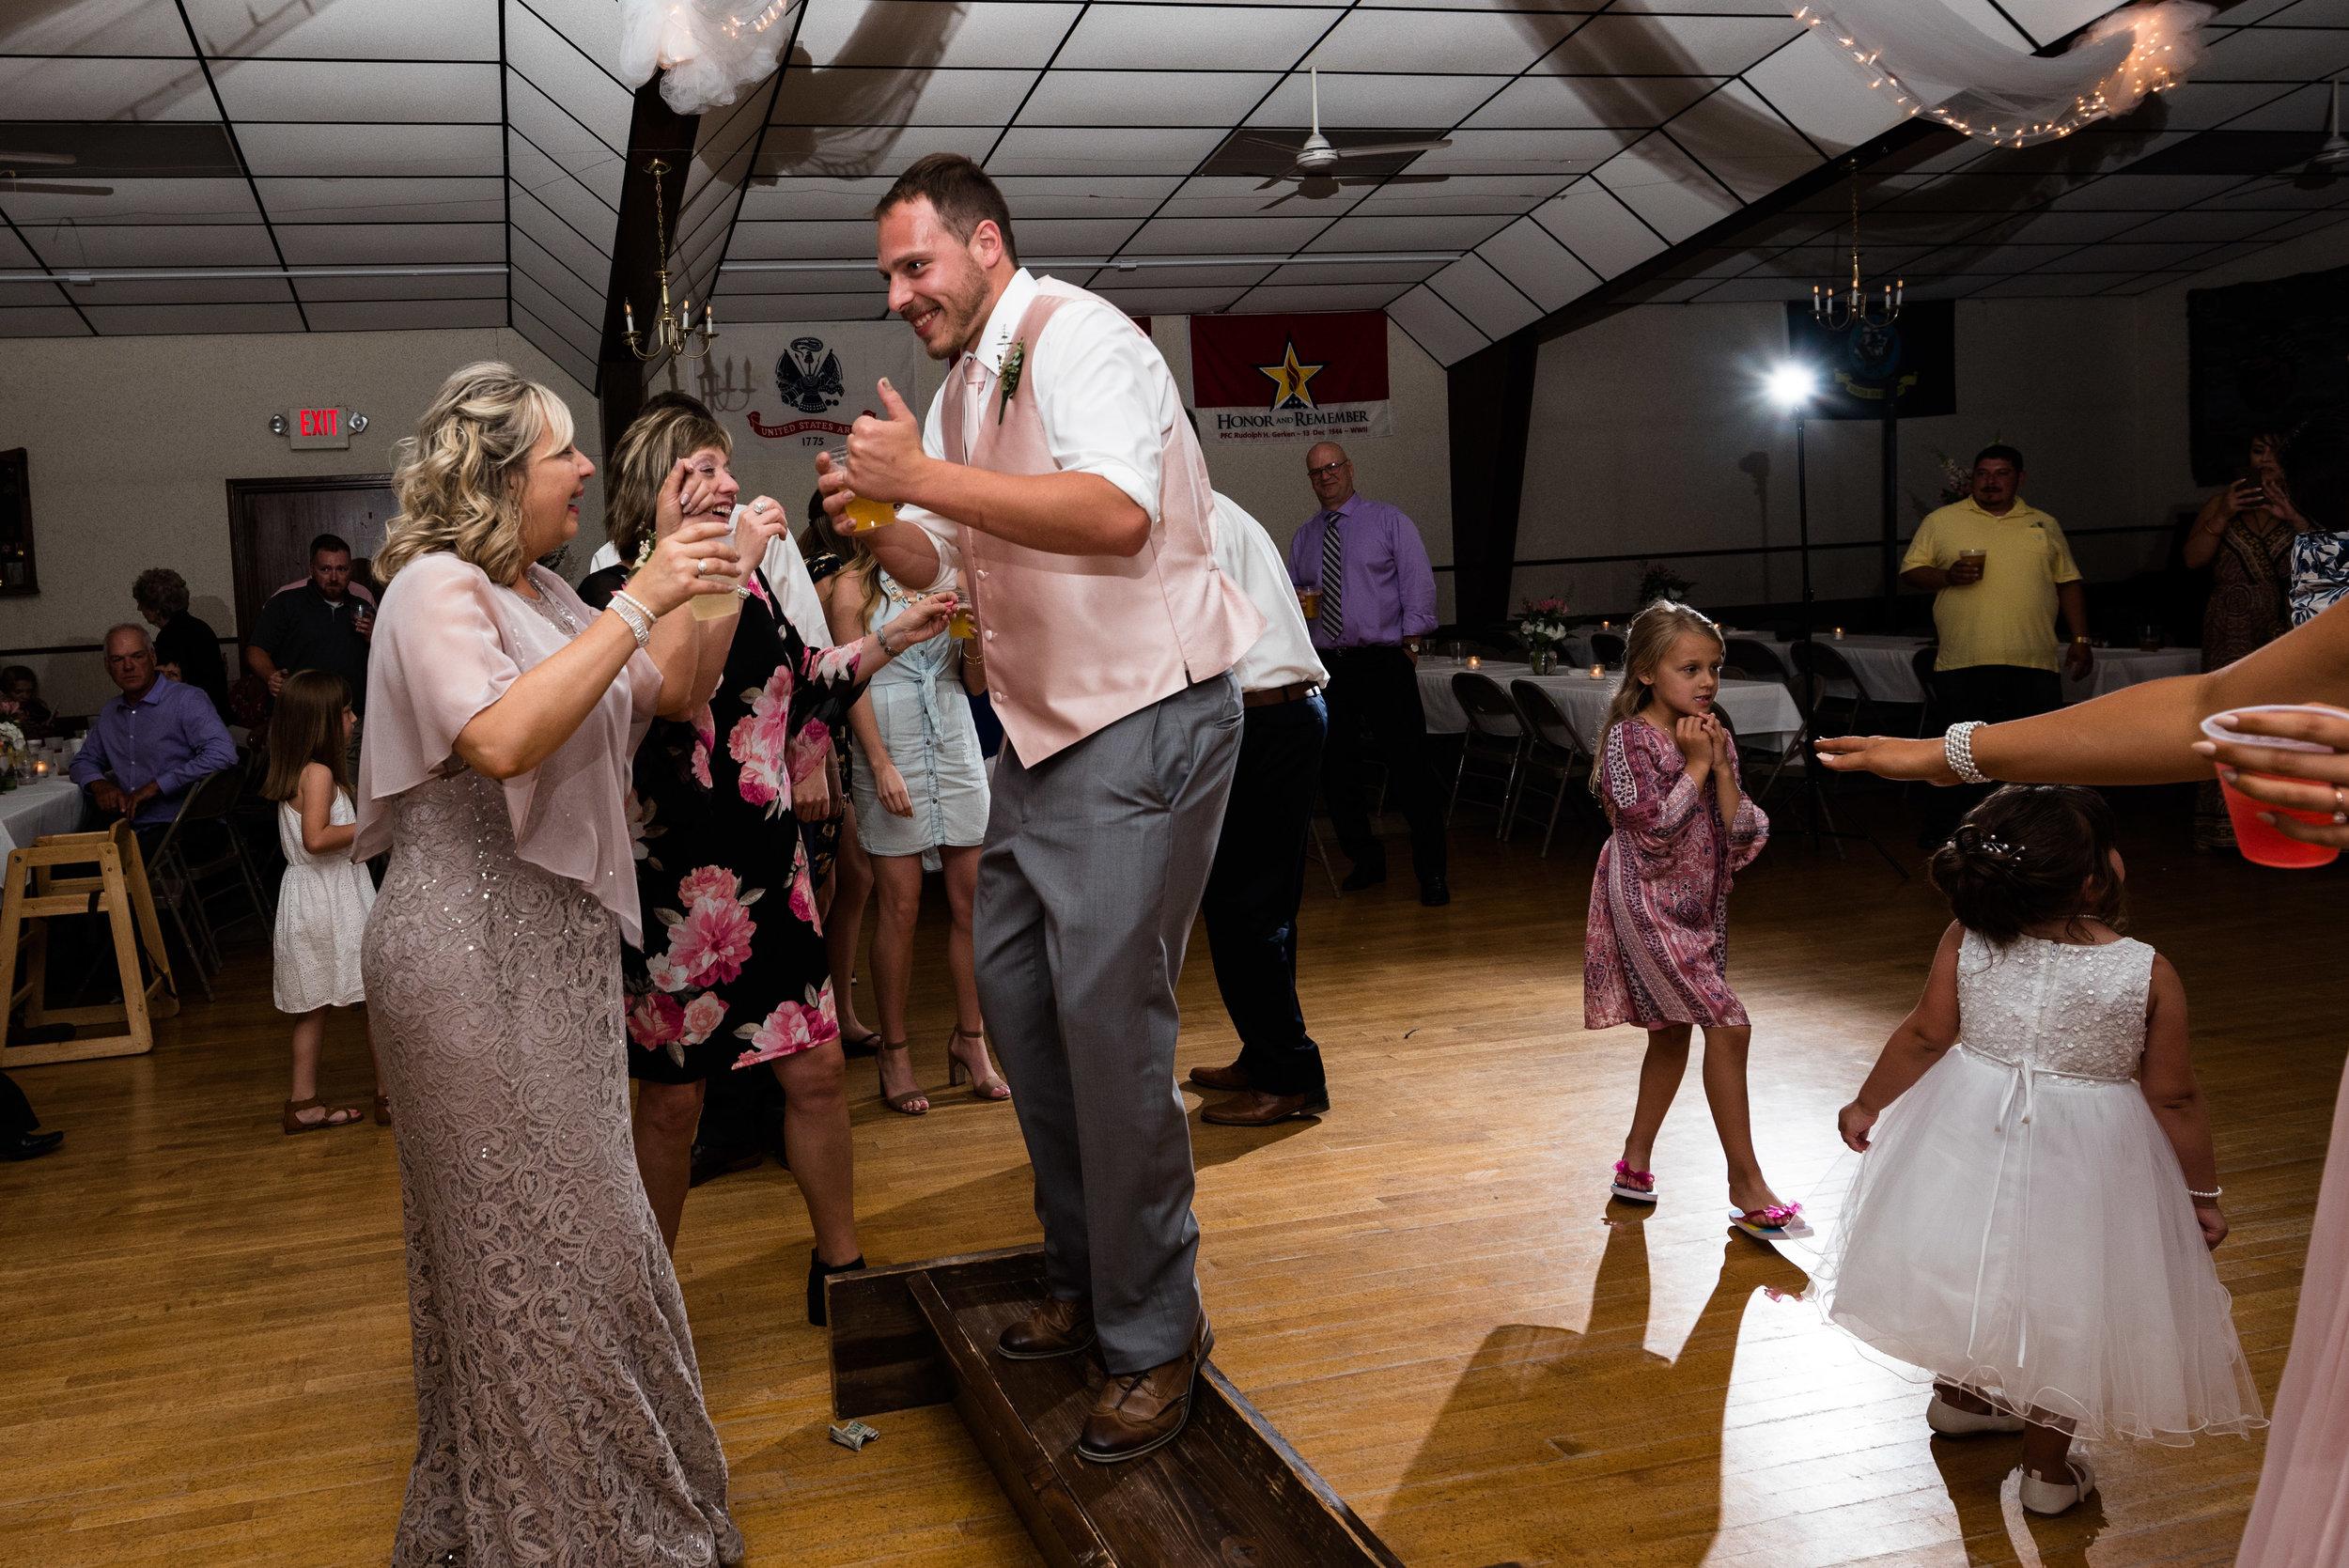 NORTHWEST OHIO WEDDING-39.jpg